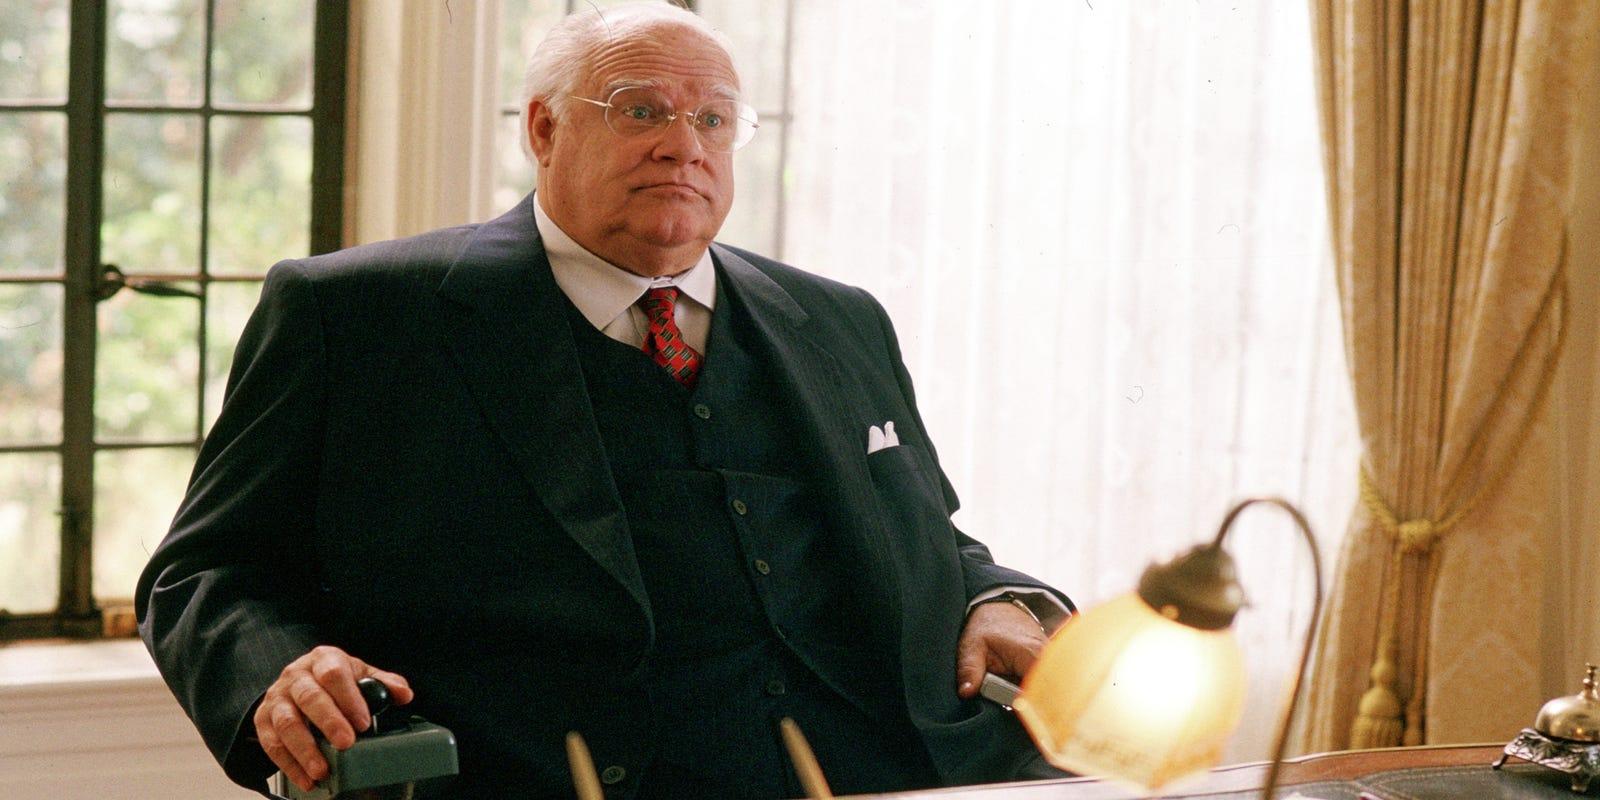 9701ac0d559  Big Lebowski  actor David Huddleston dies at 85